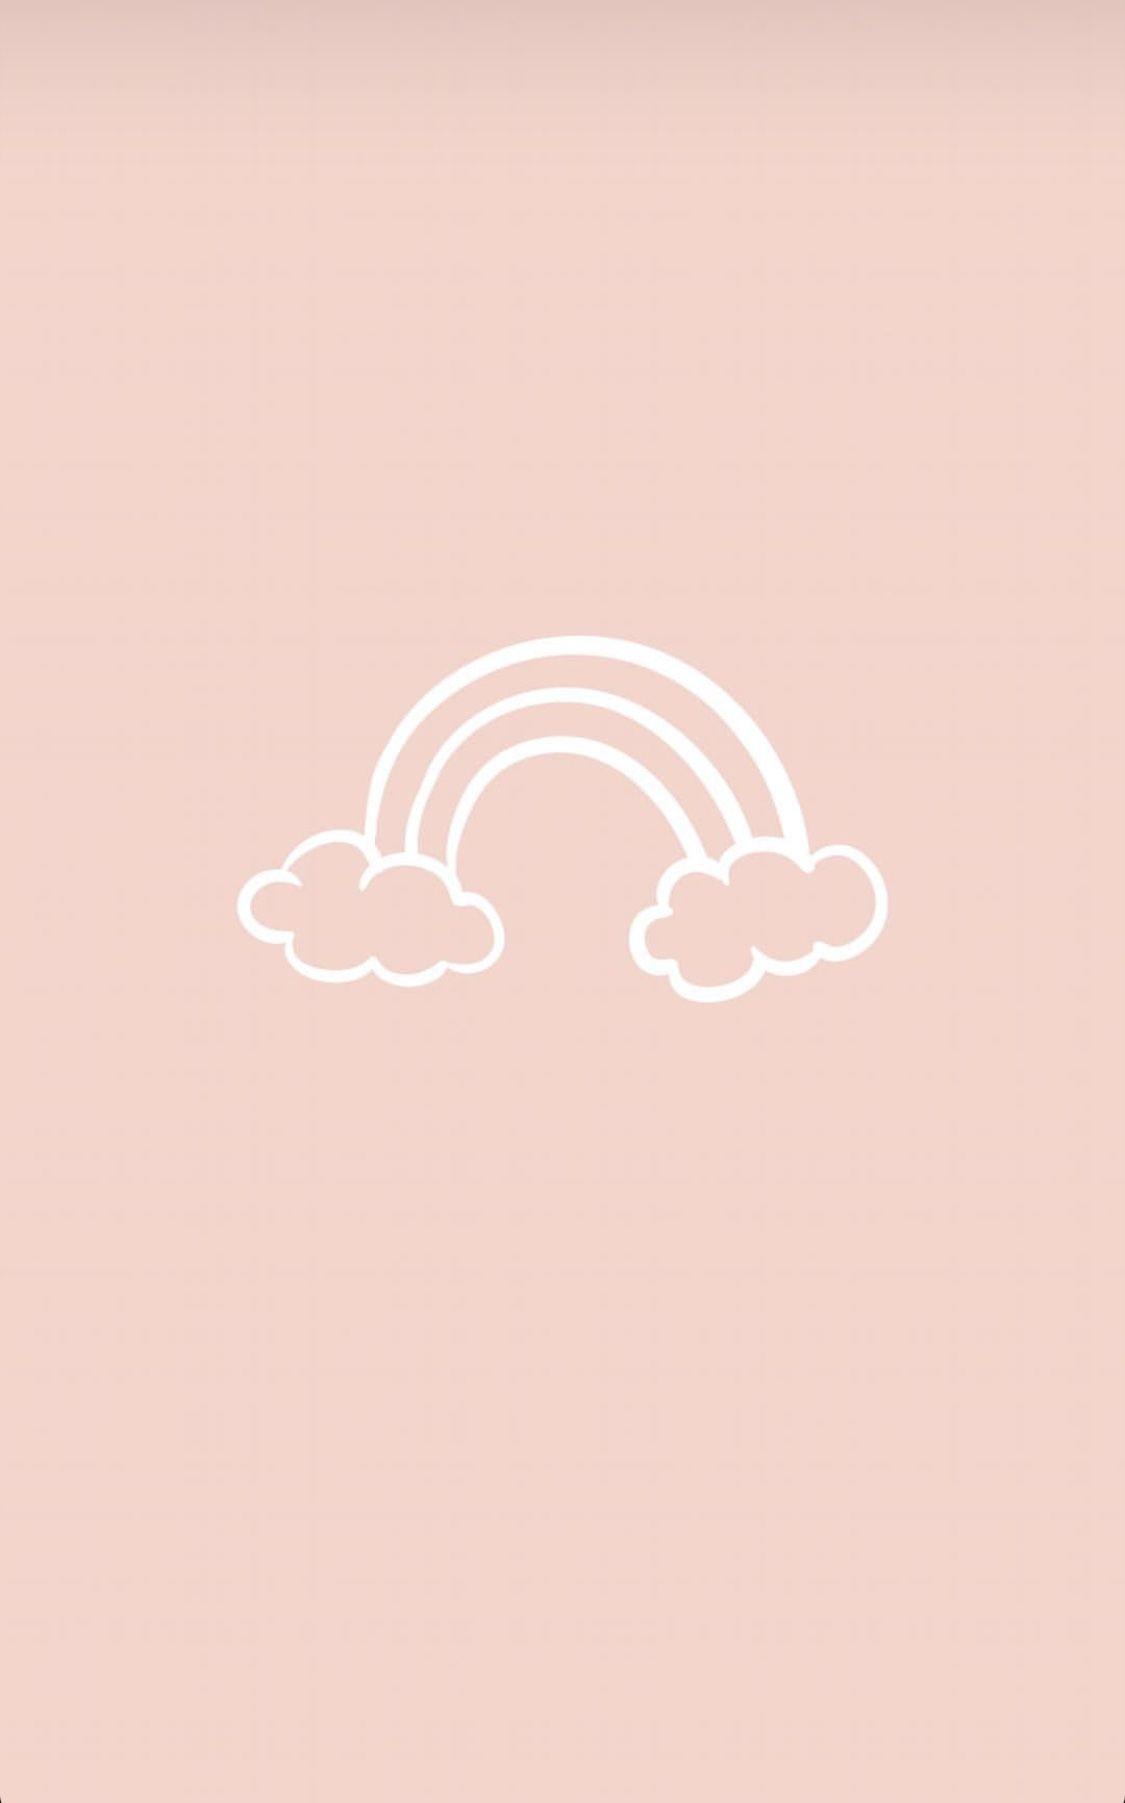 Highlight Cute Wallpapers Cute Backgrounds Instagram Highlight